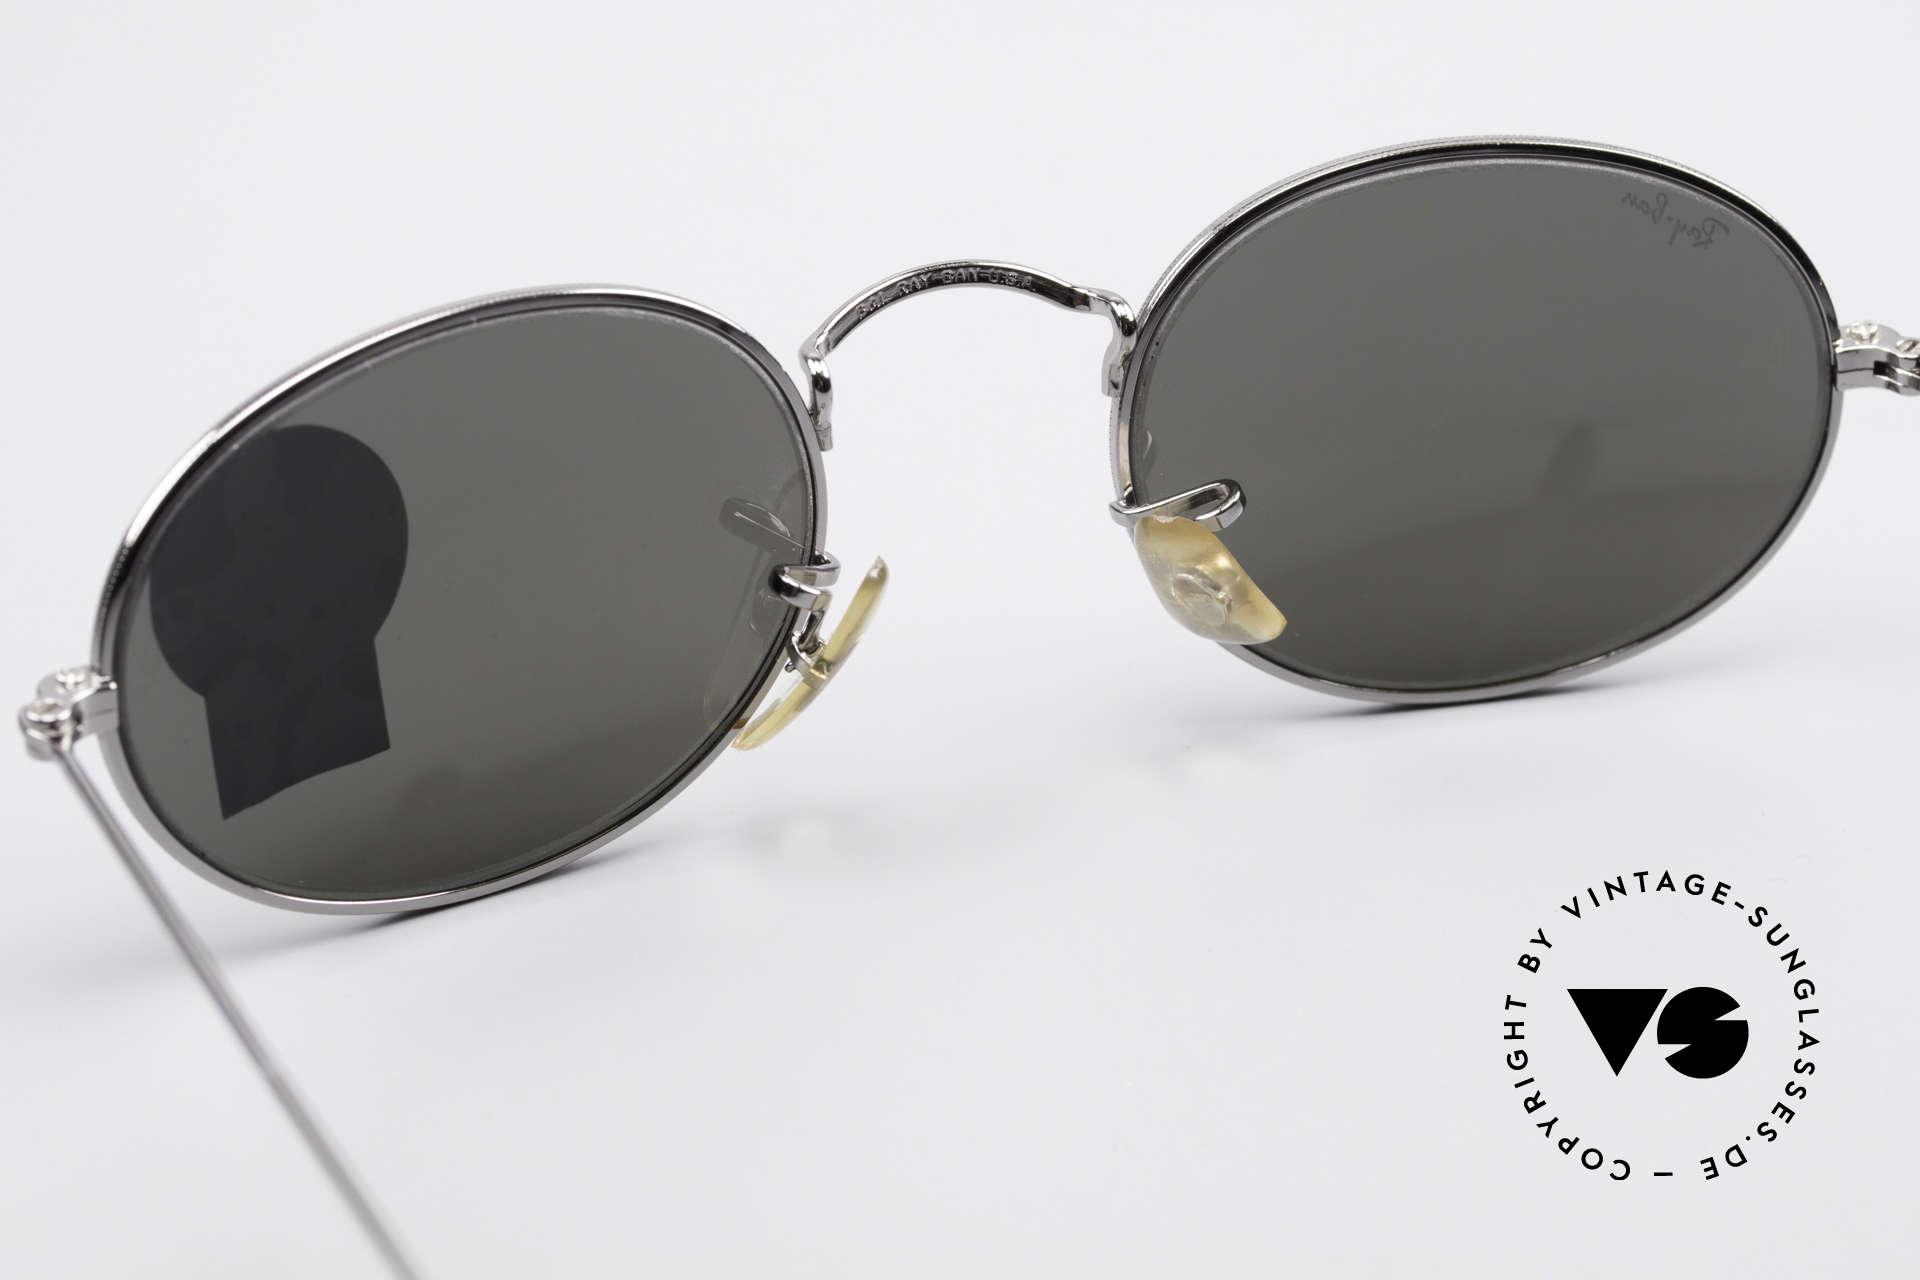 Ray Ban Classic Style I Mirrored B&L USA Sunglasses, NO retro sunglasses, but a rare old USA original, Made for Men and Women